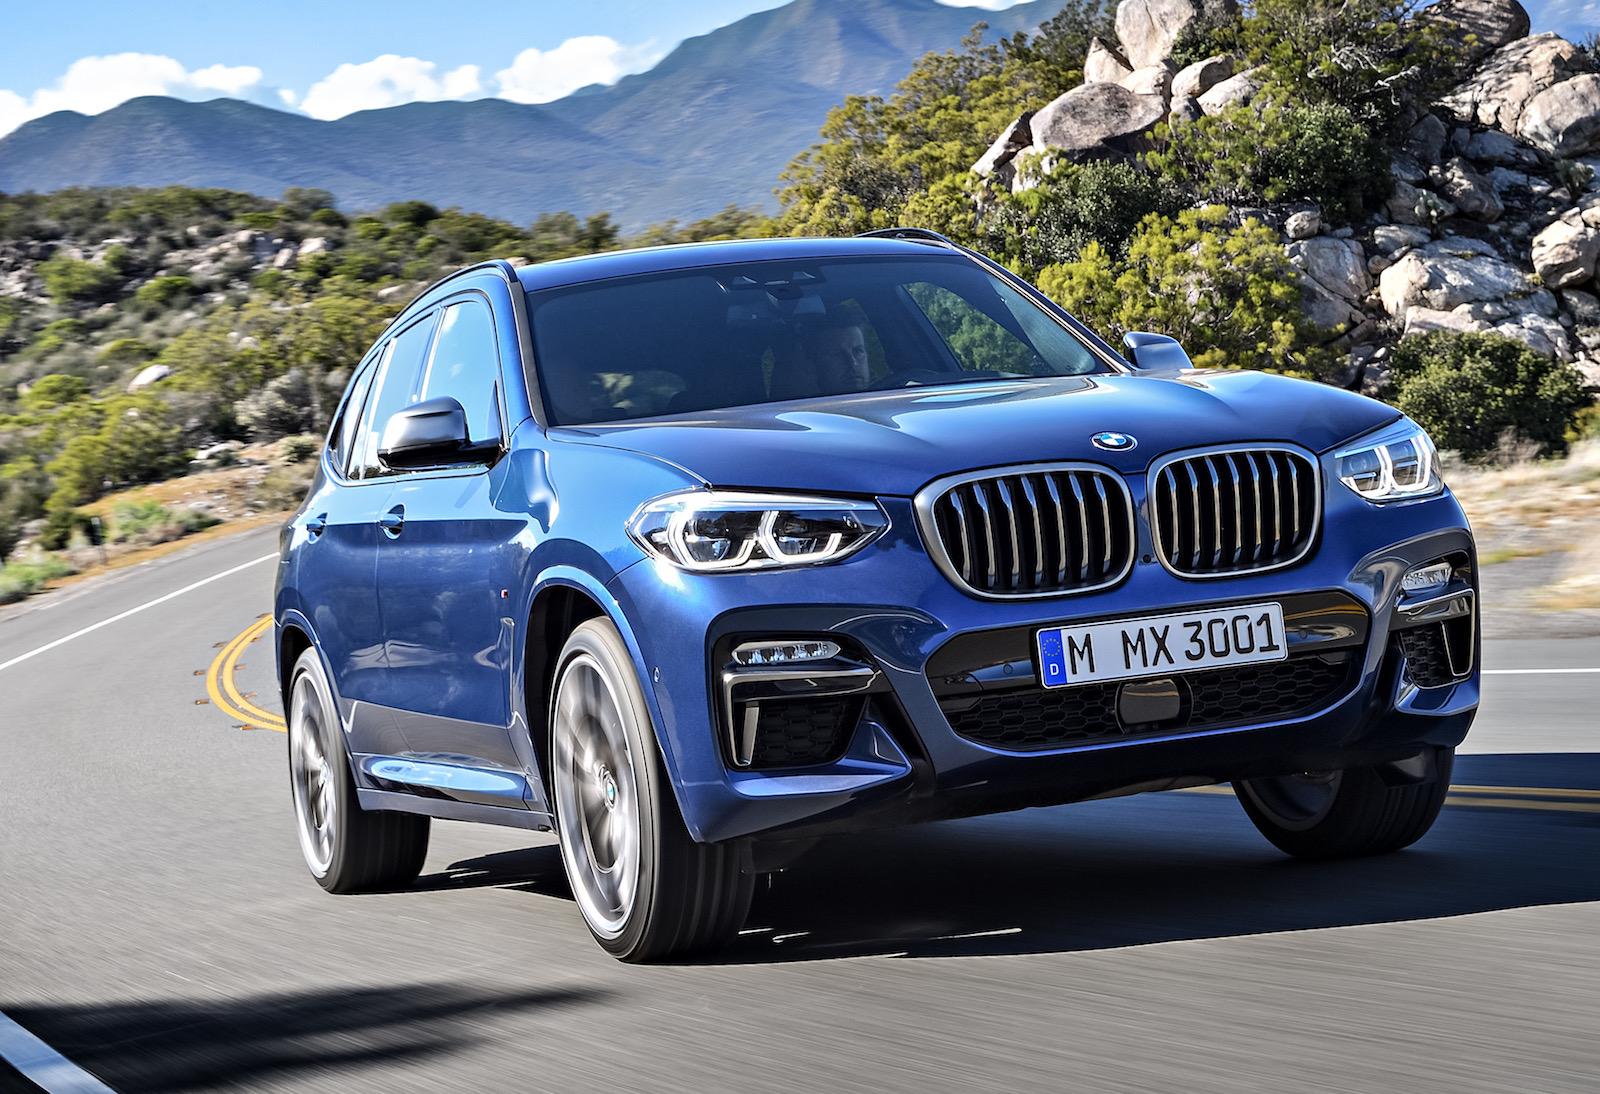 Bmw X3 M40d Performance Diesel Confirmed With Showroom Updates Performancedrive